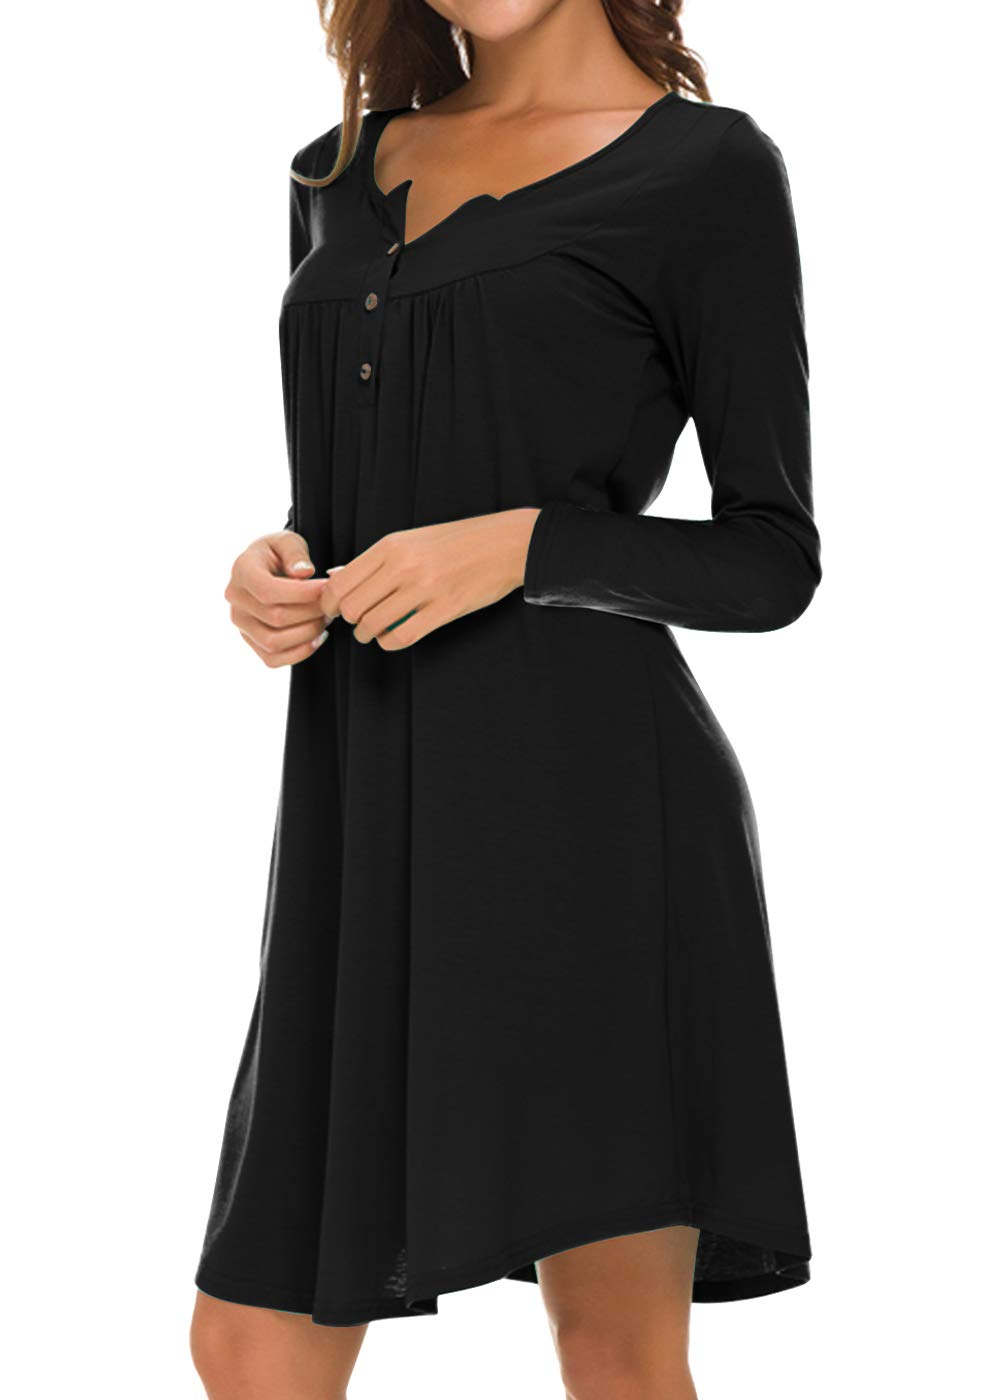 Eanklosco Long Sleeve Swing Dress Women Casual Loose Henley Shirt Dress (Black, M)